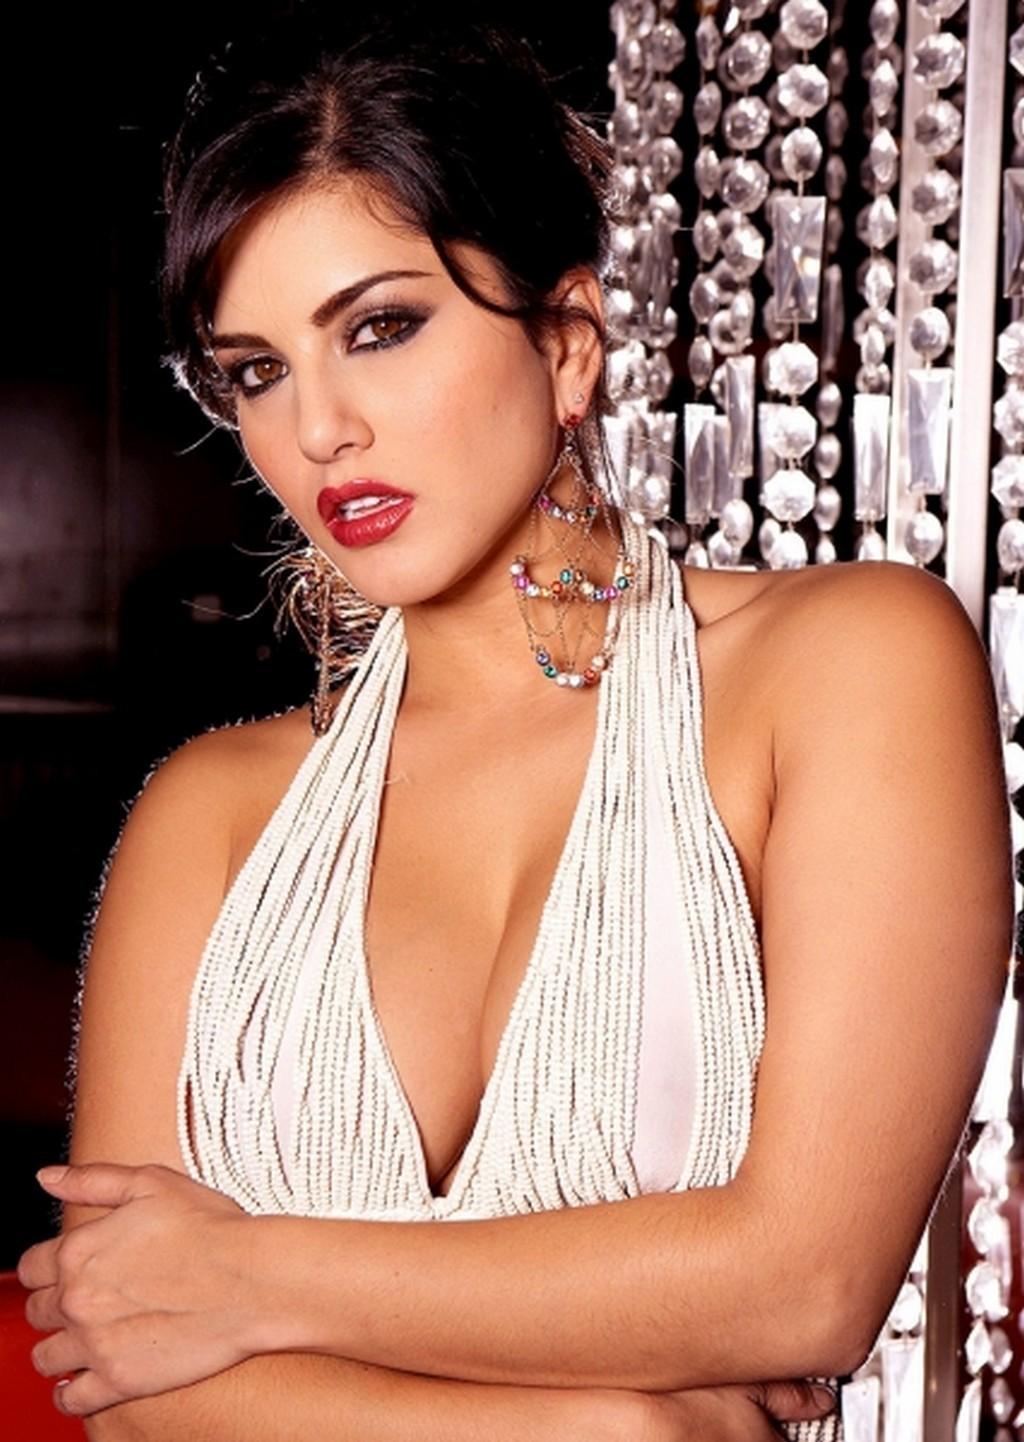 Sunny Leone Latest Hot Cleavage Photos - Movieezreel -9701